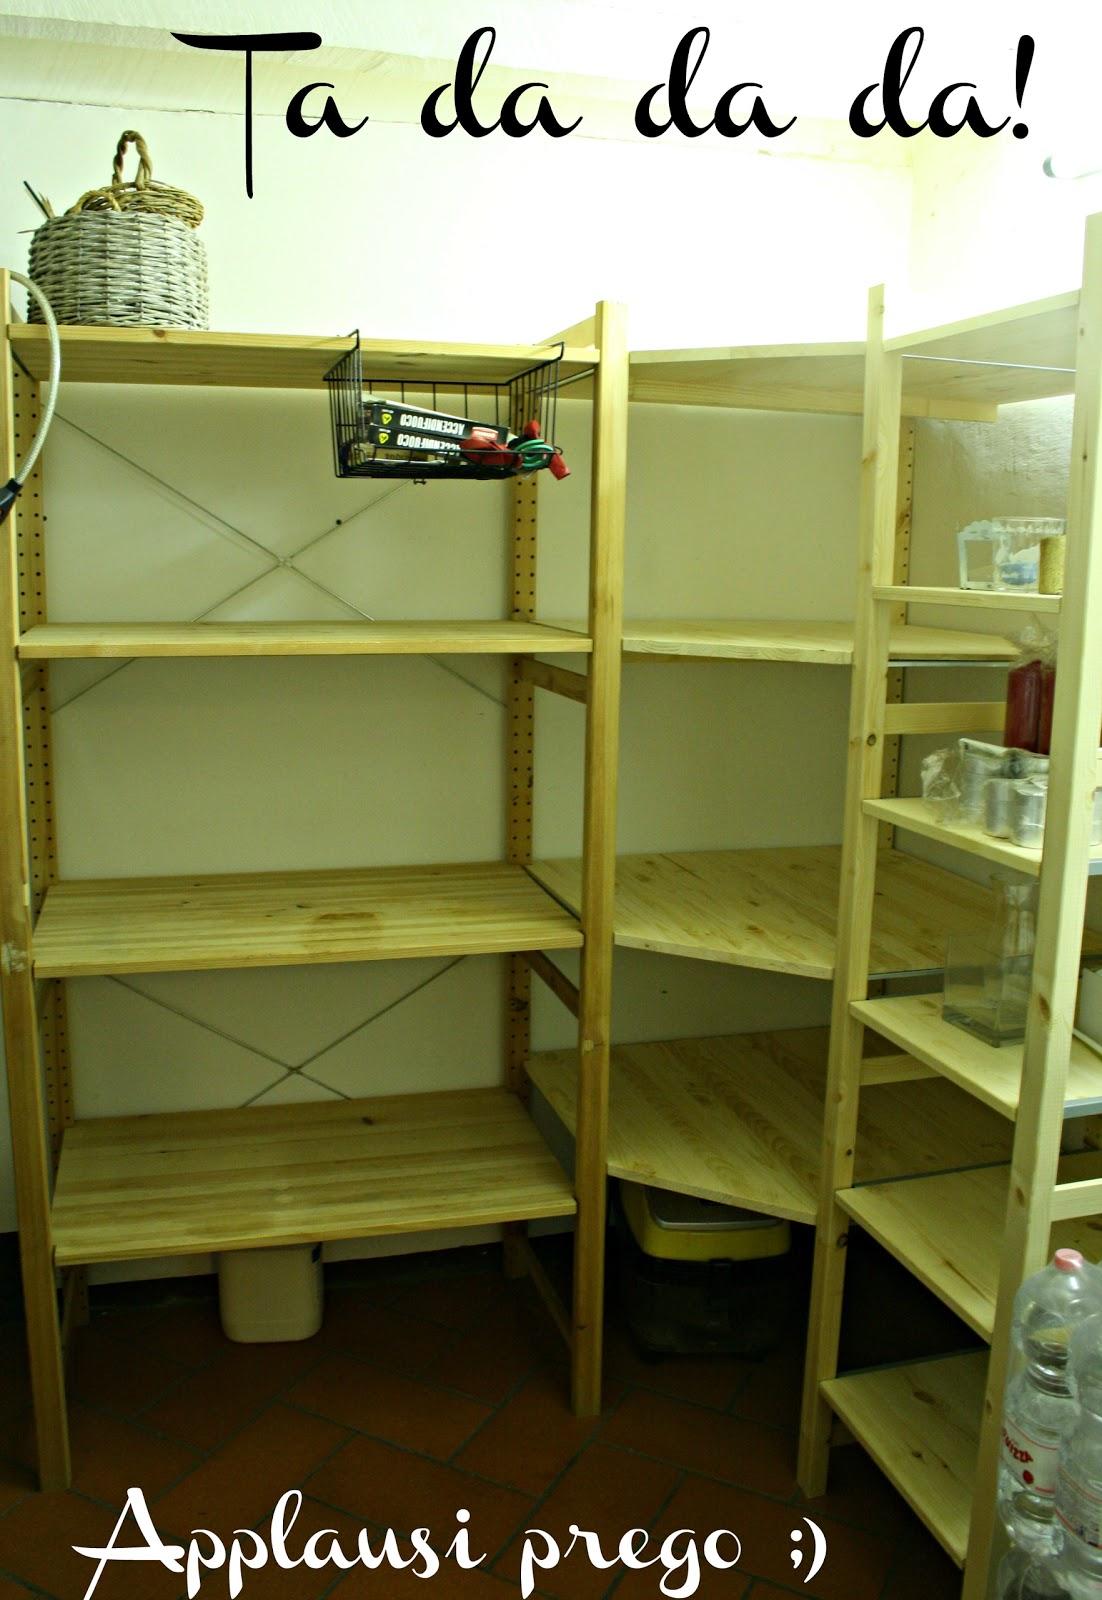 Nel nido come montare un ivar angolare ikea senza for Ikea scaffali ivar